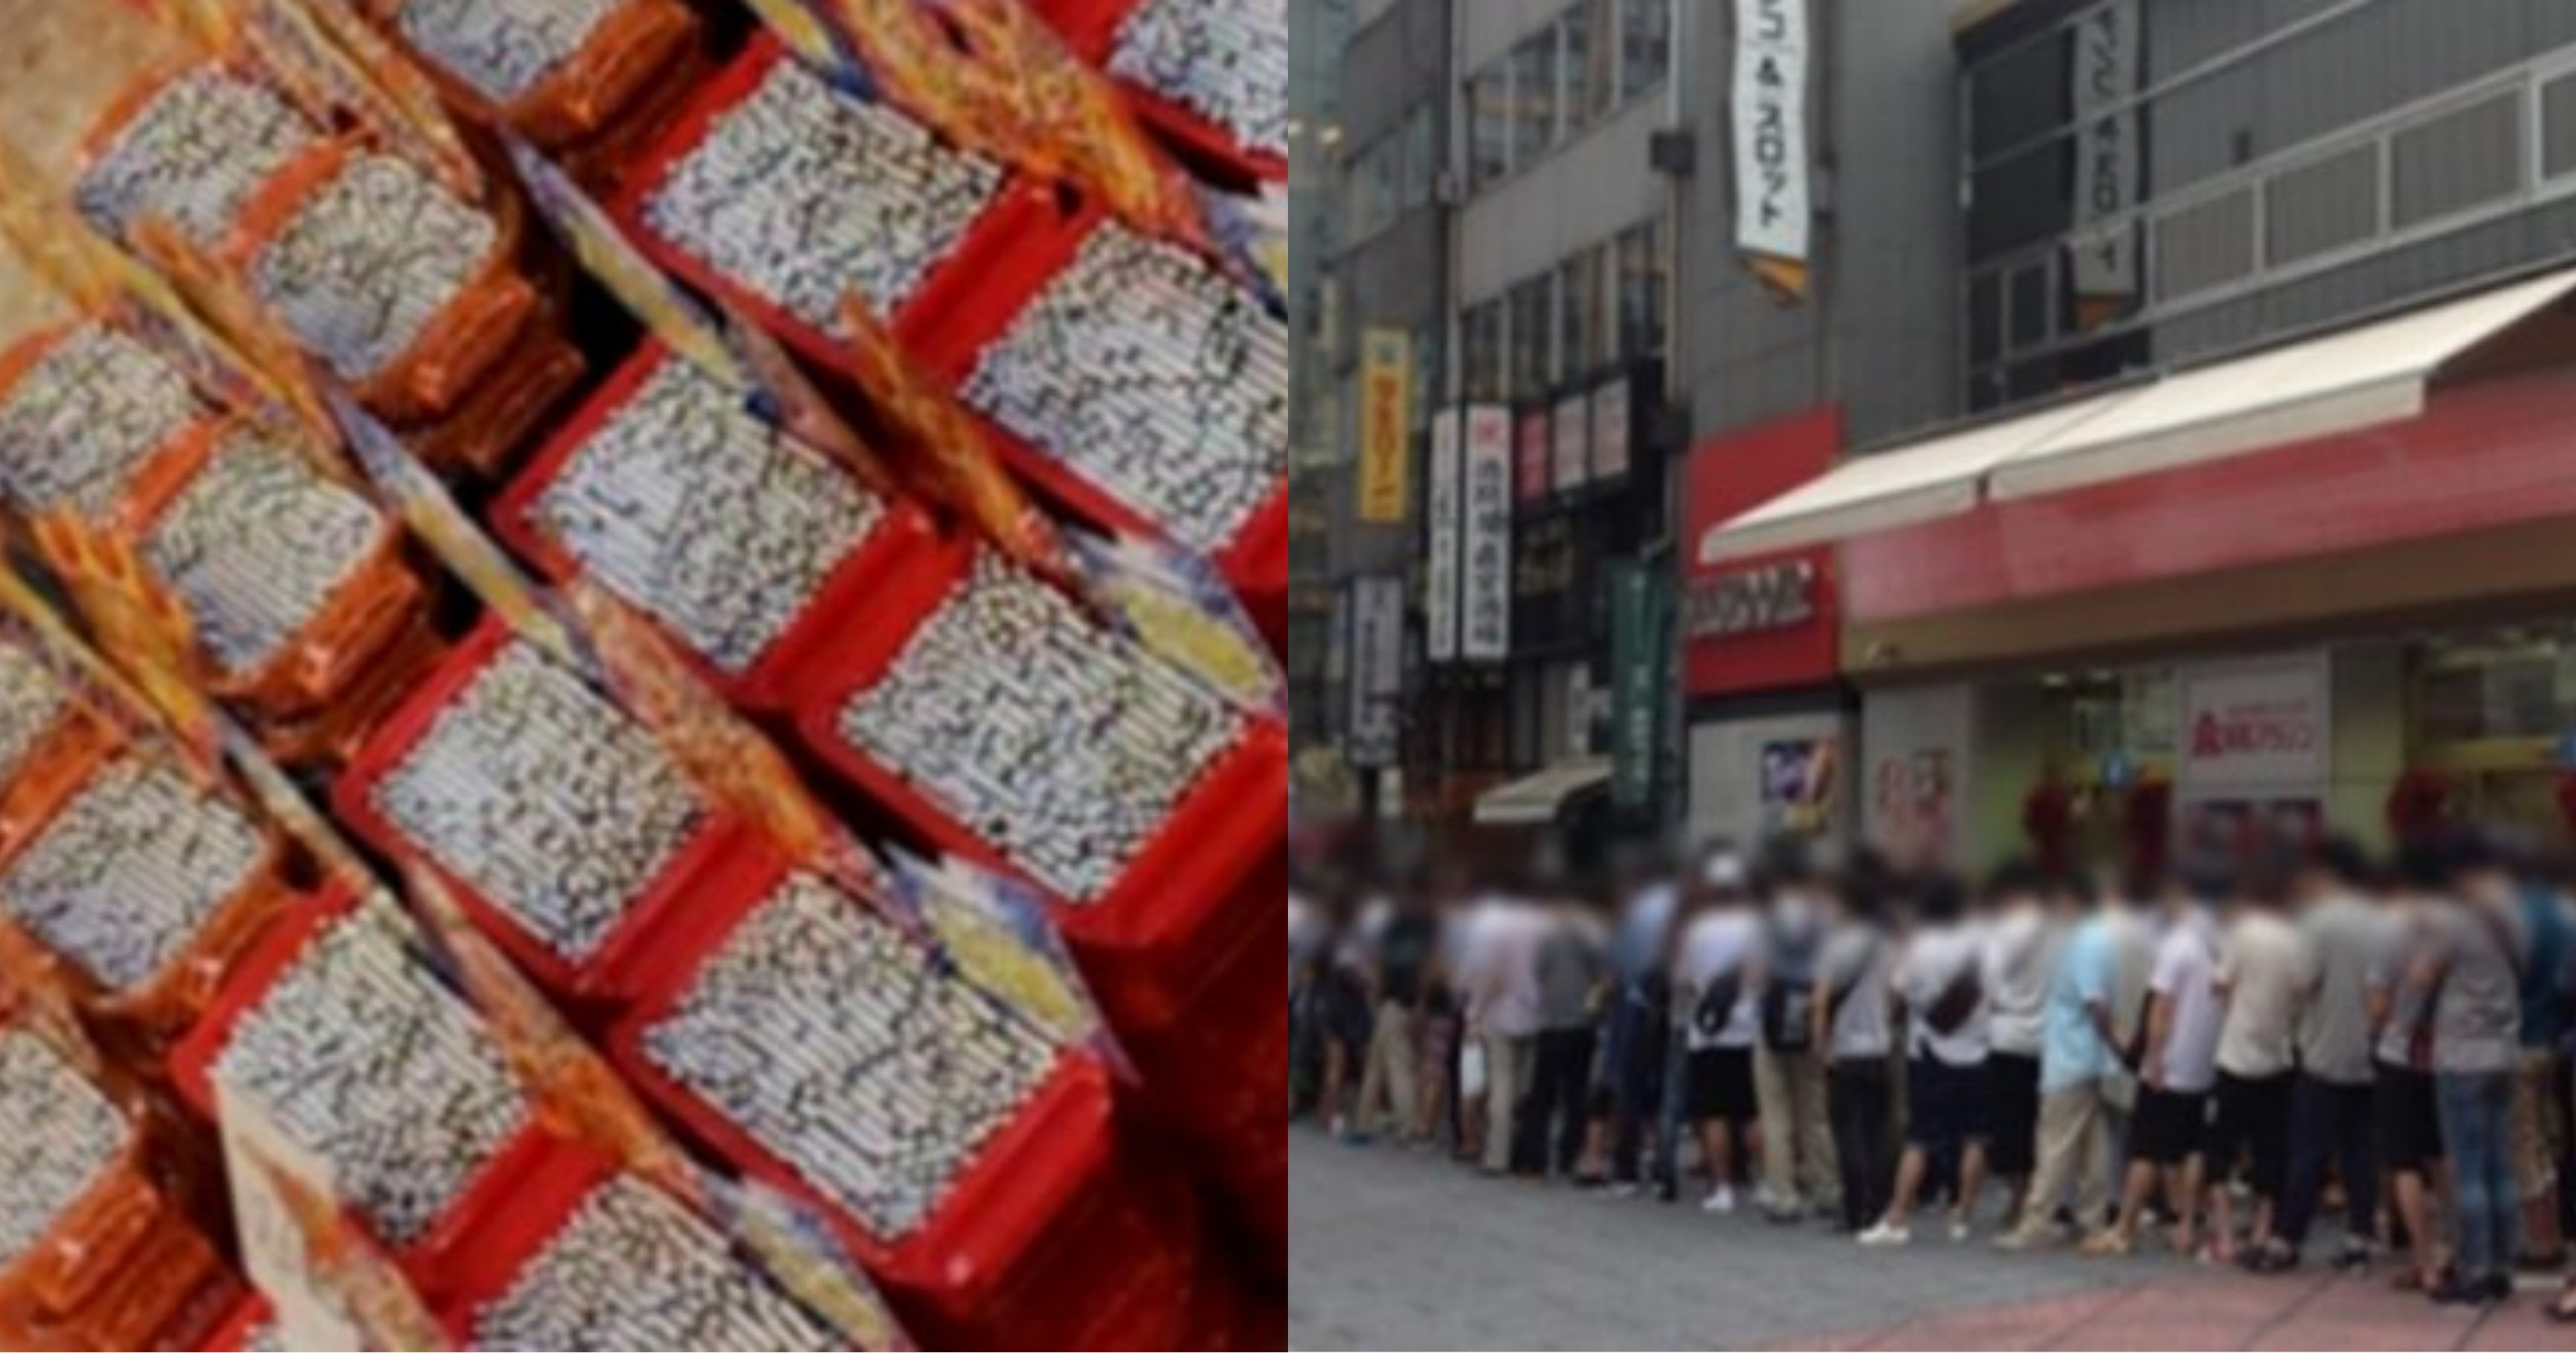 kakaotalk 20211019 162025833.jpg?resize=412,232 - 대부분 한국인들이 일본 여행 도중에 보고 놀란다는 '일본의 독특한 문화'